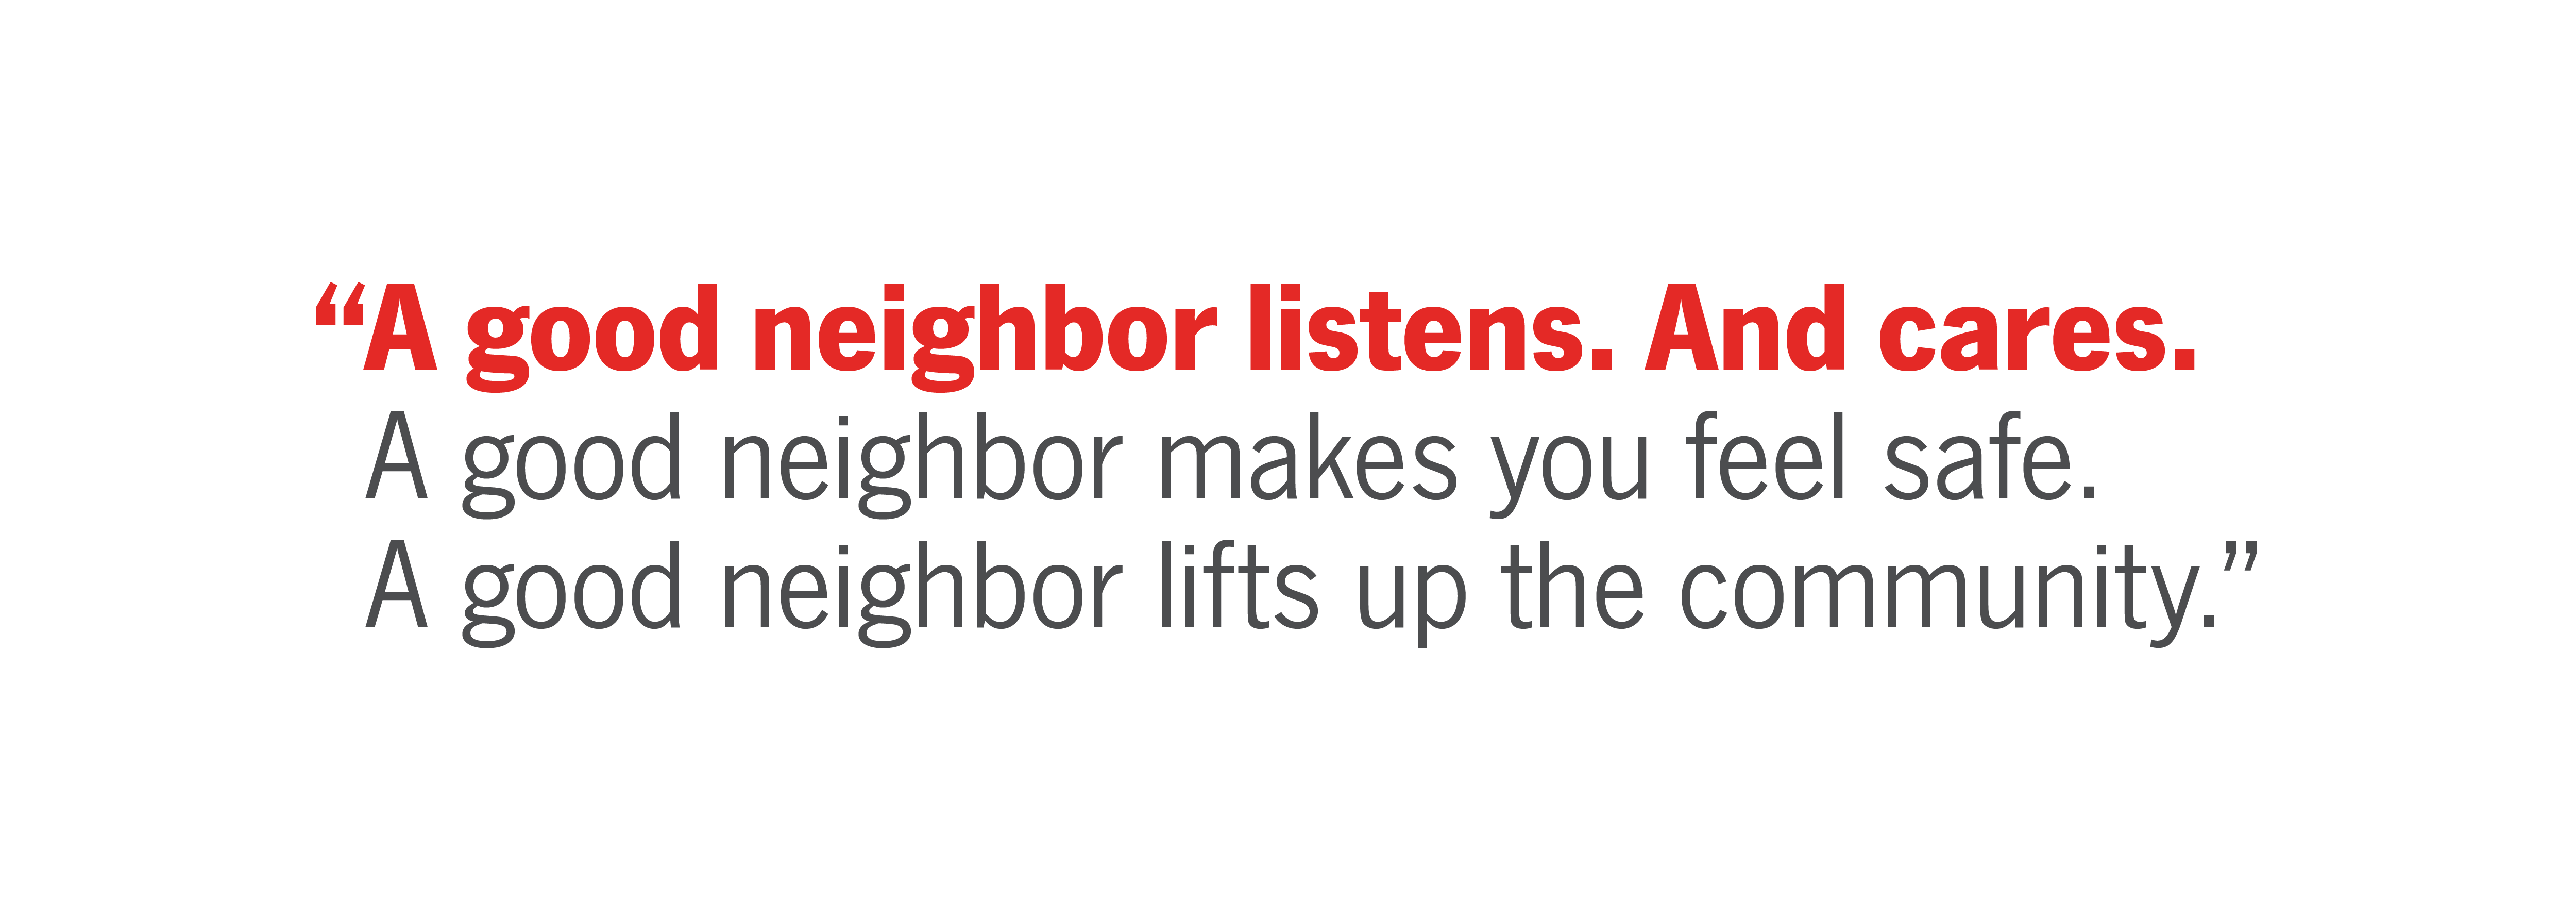 Join The Movement At NeighborhoodofGood.com